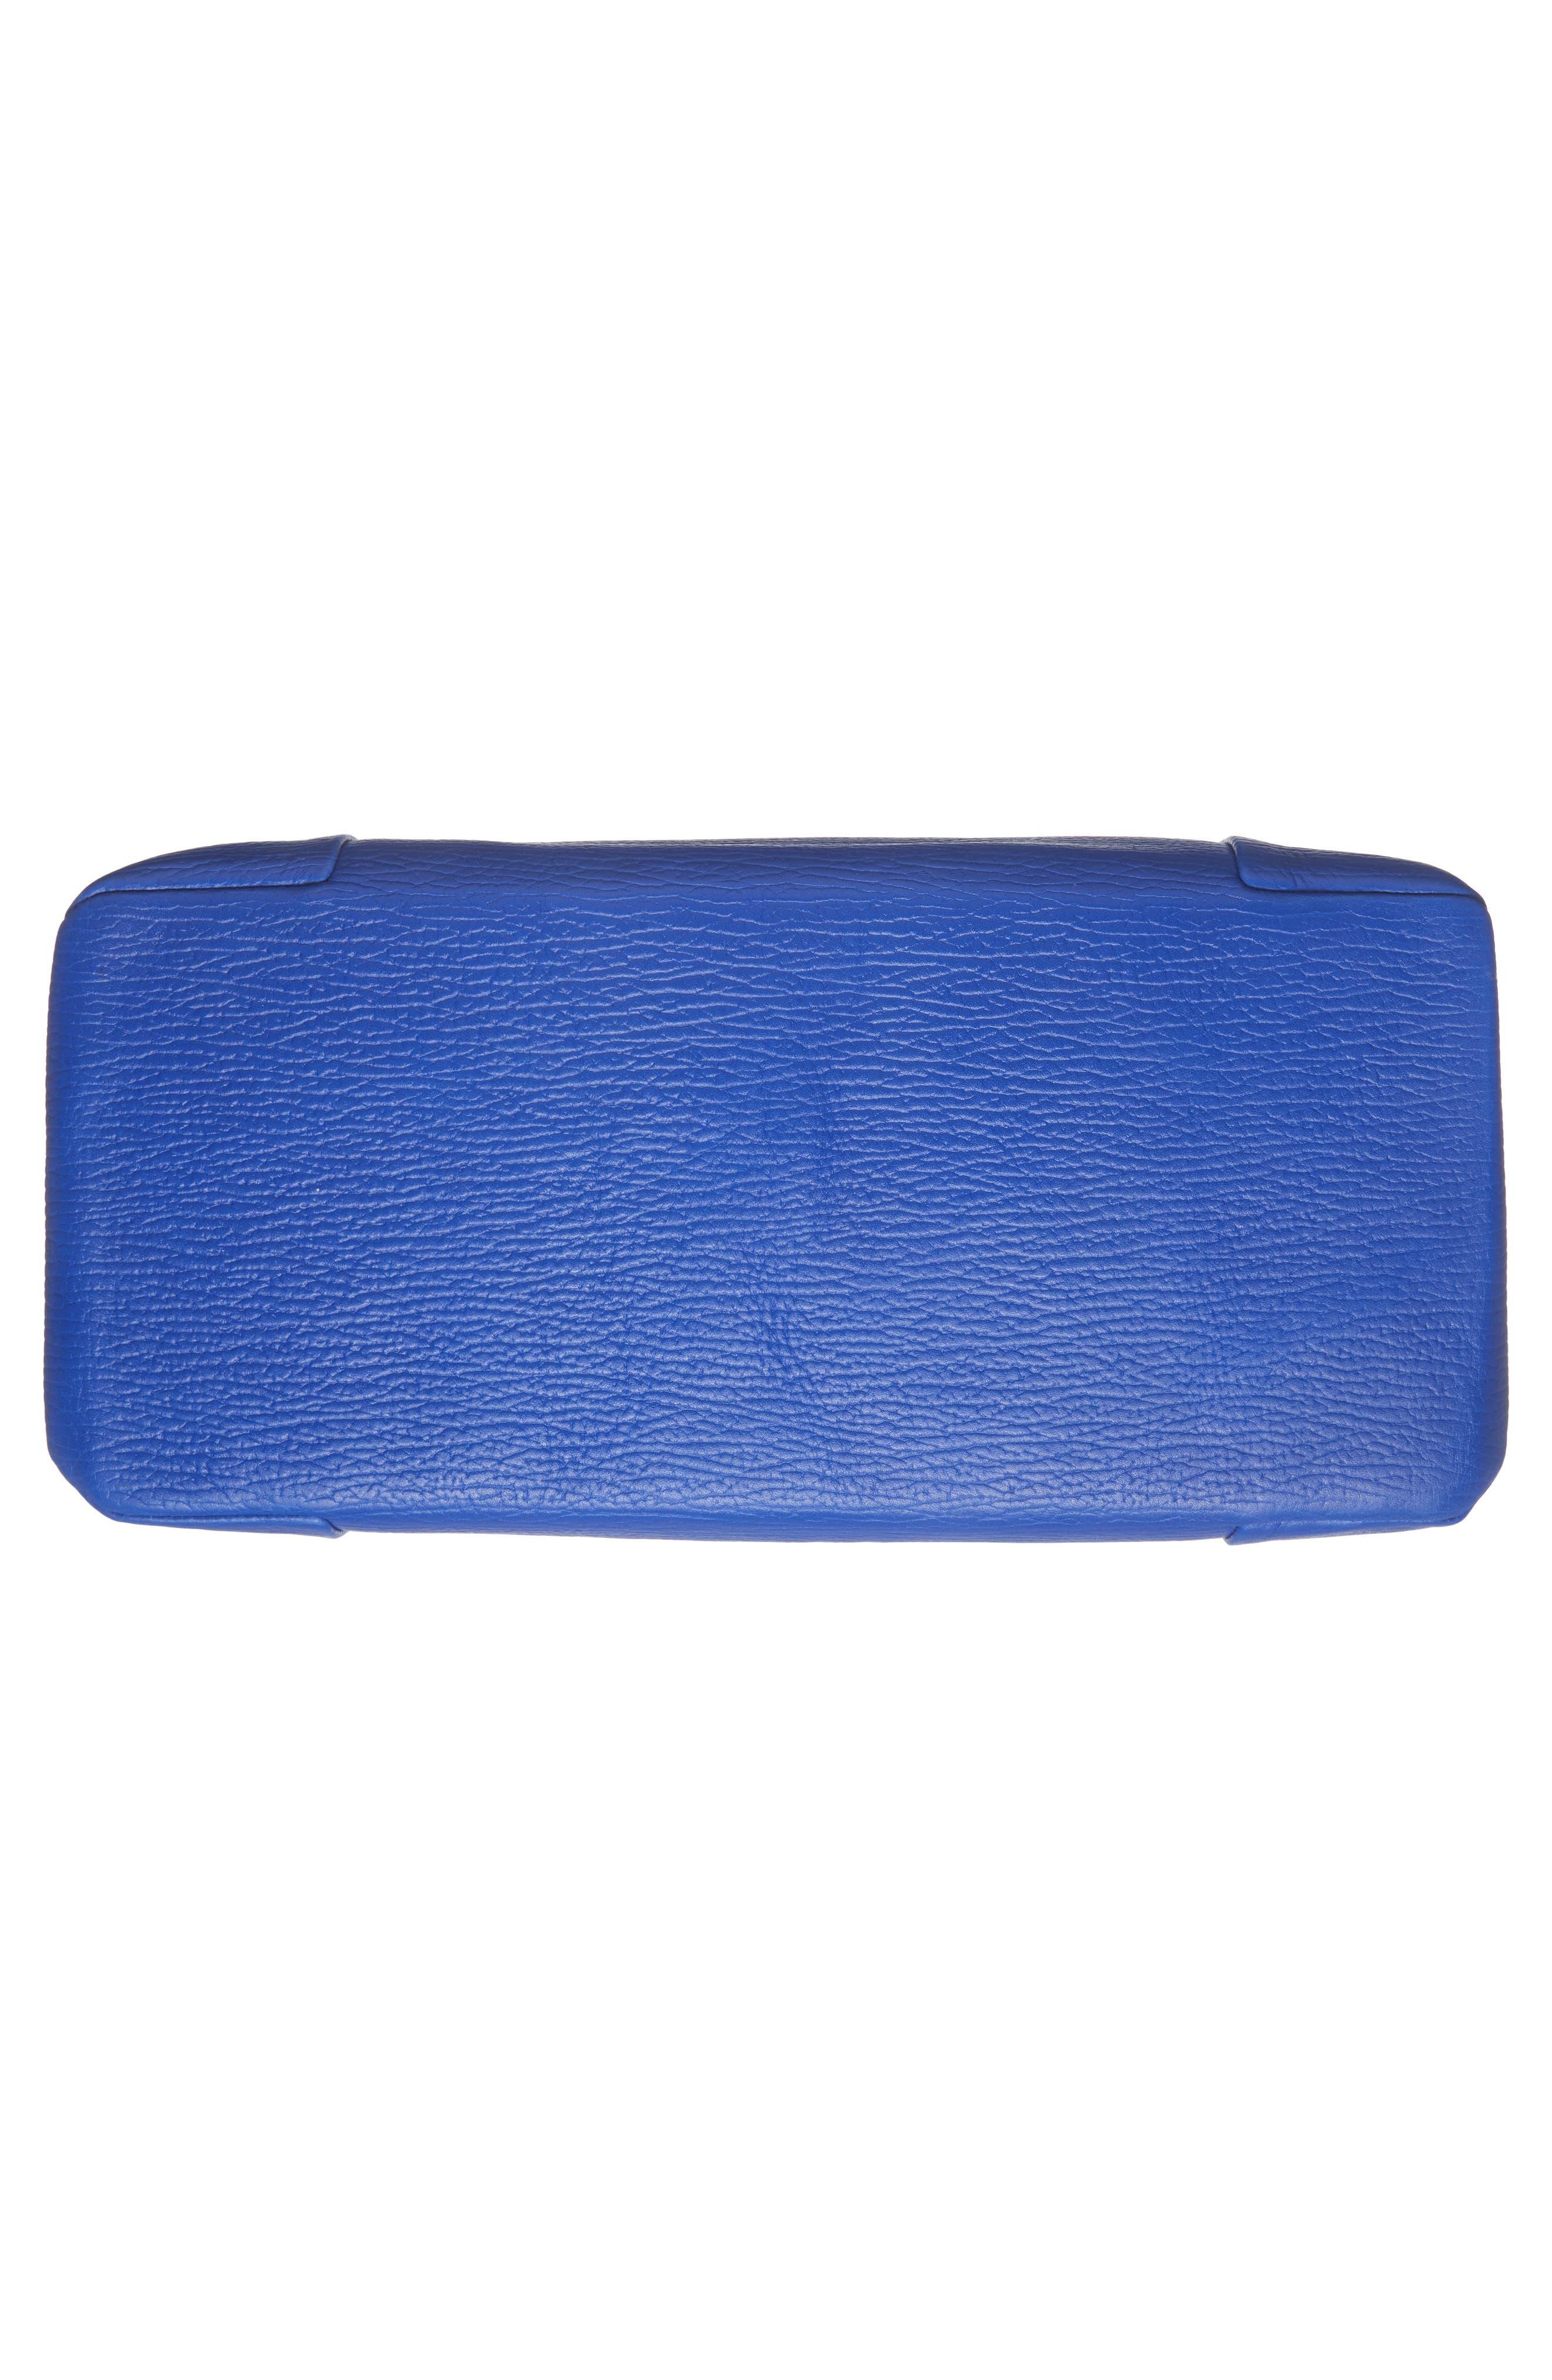 Proter Leather Shoulder Bag,                             Alternate thumbnail 5, color,                             Bright Blue